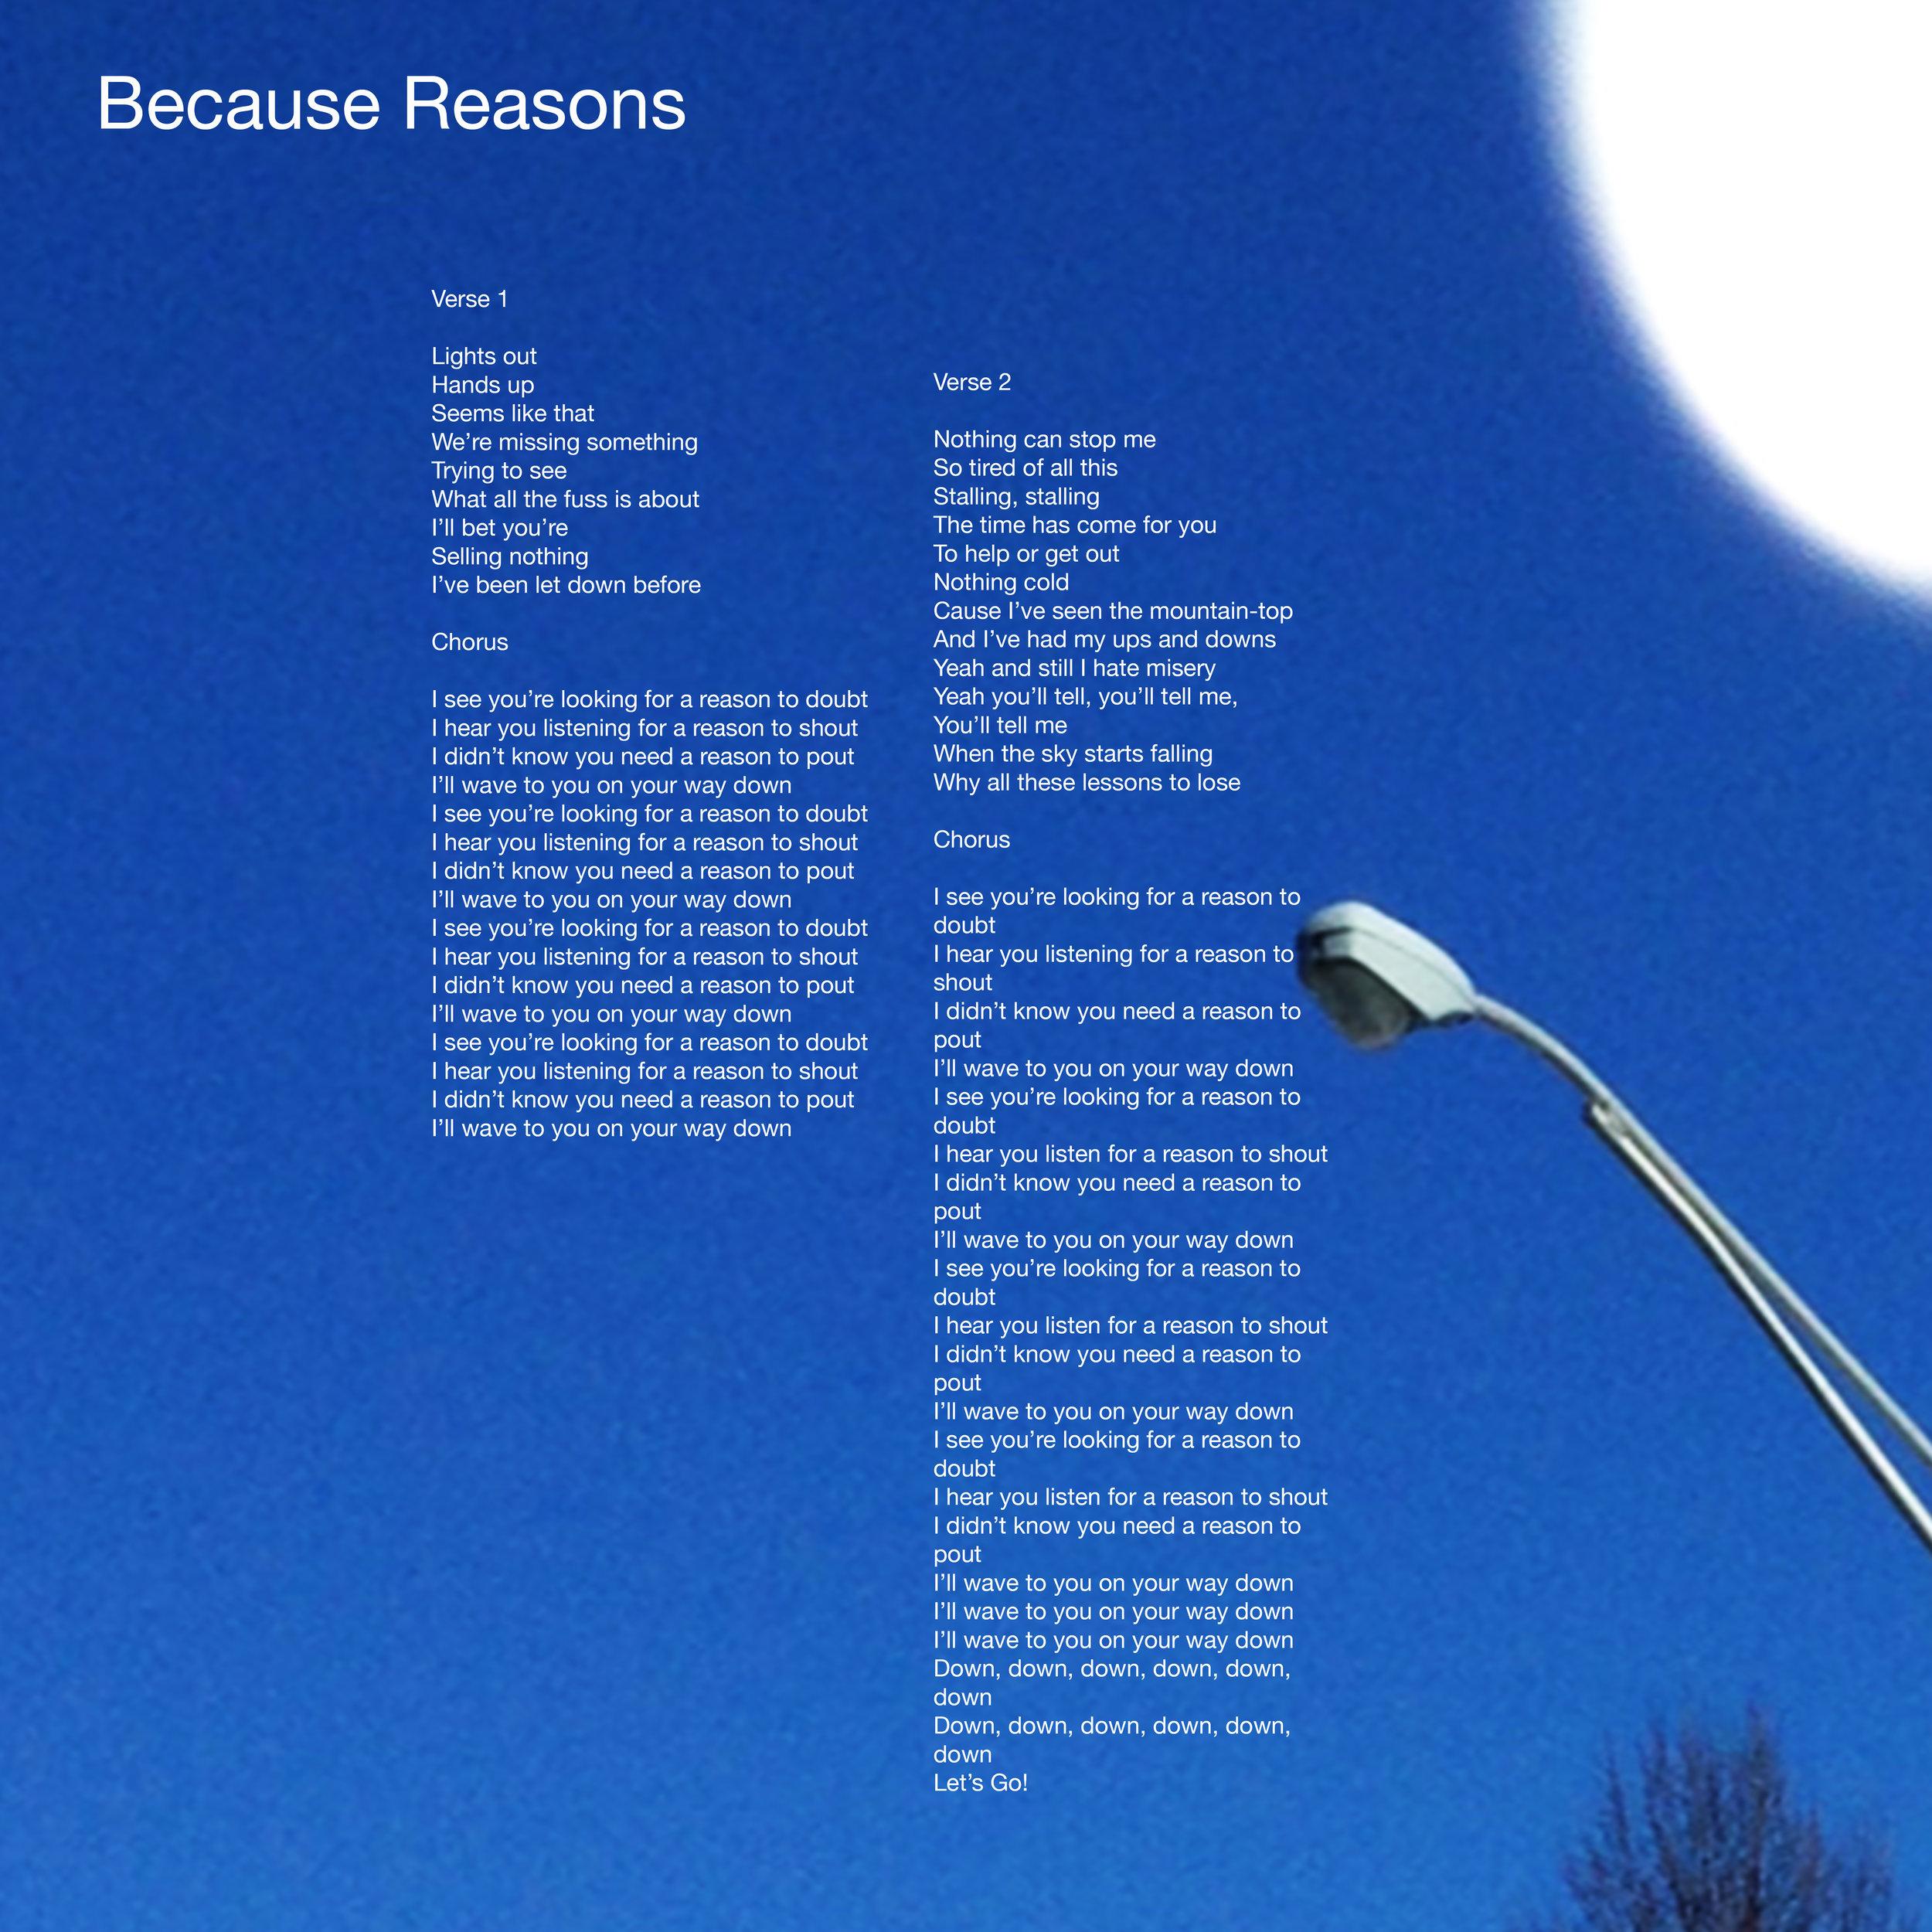 BecauseReasonsLyricArtDLX.jpg